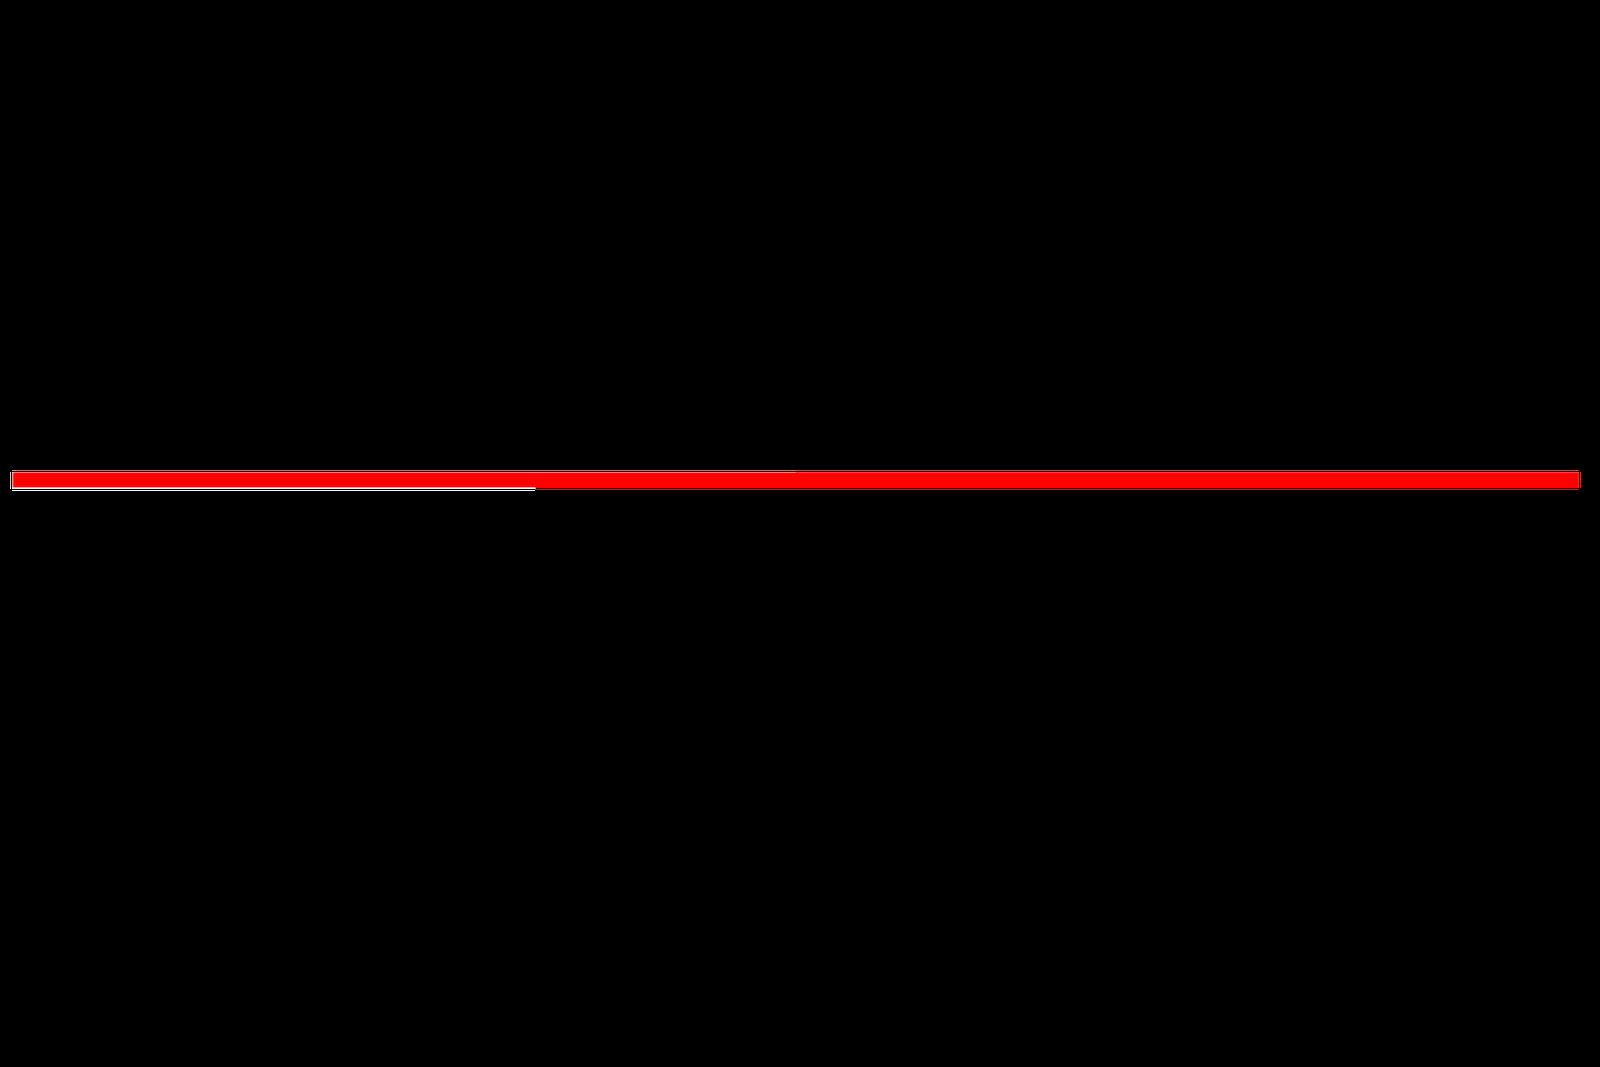 Line clipart transparent Clip – Download Art Art